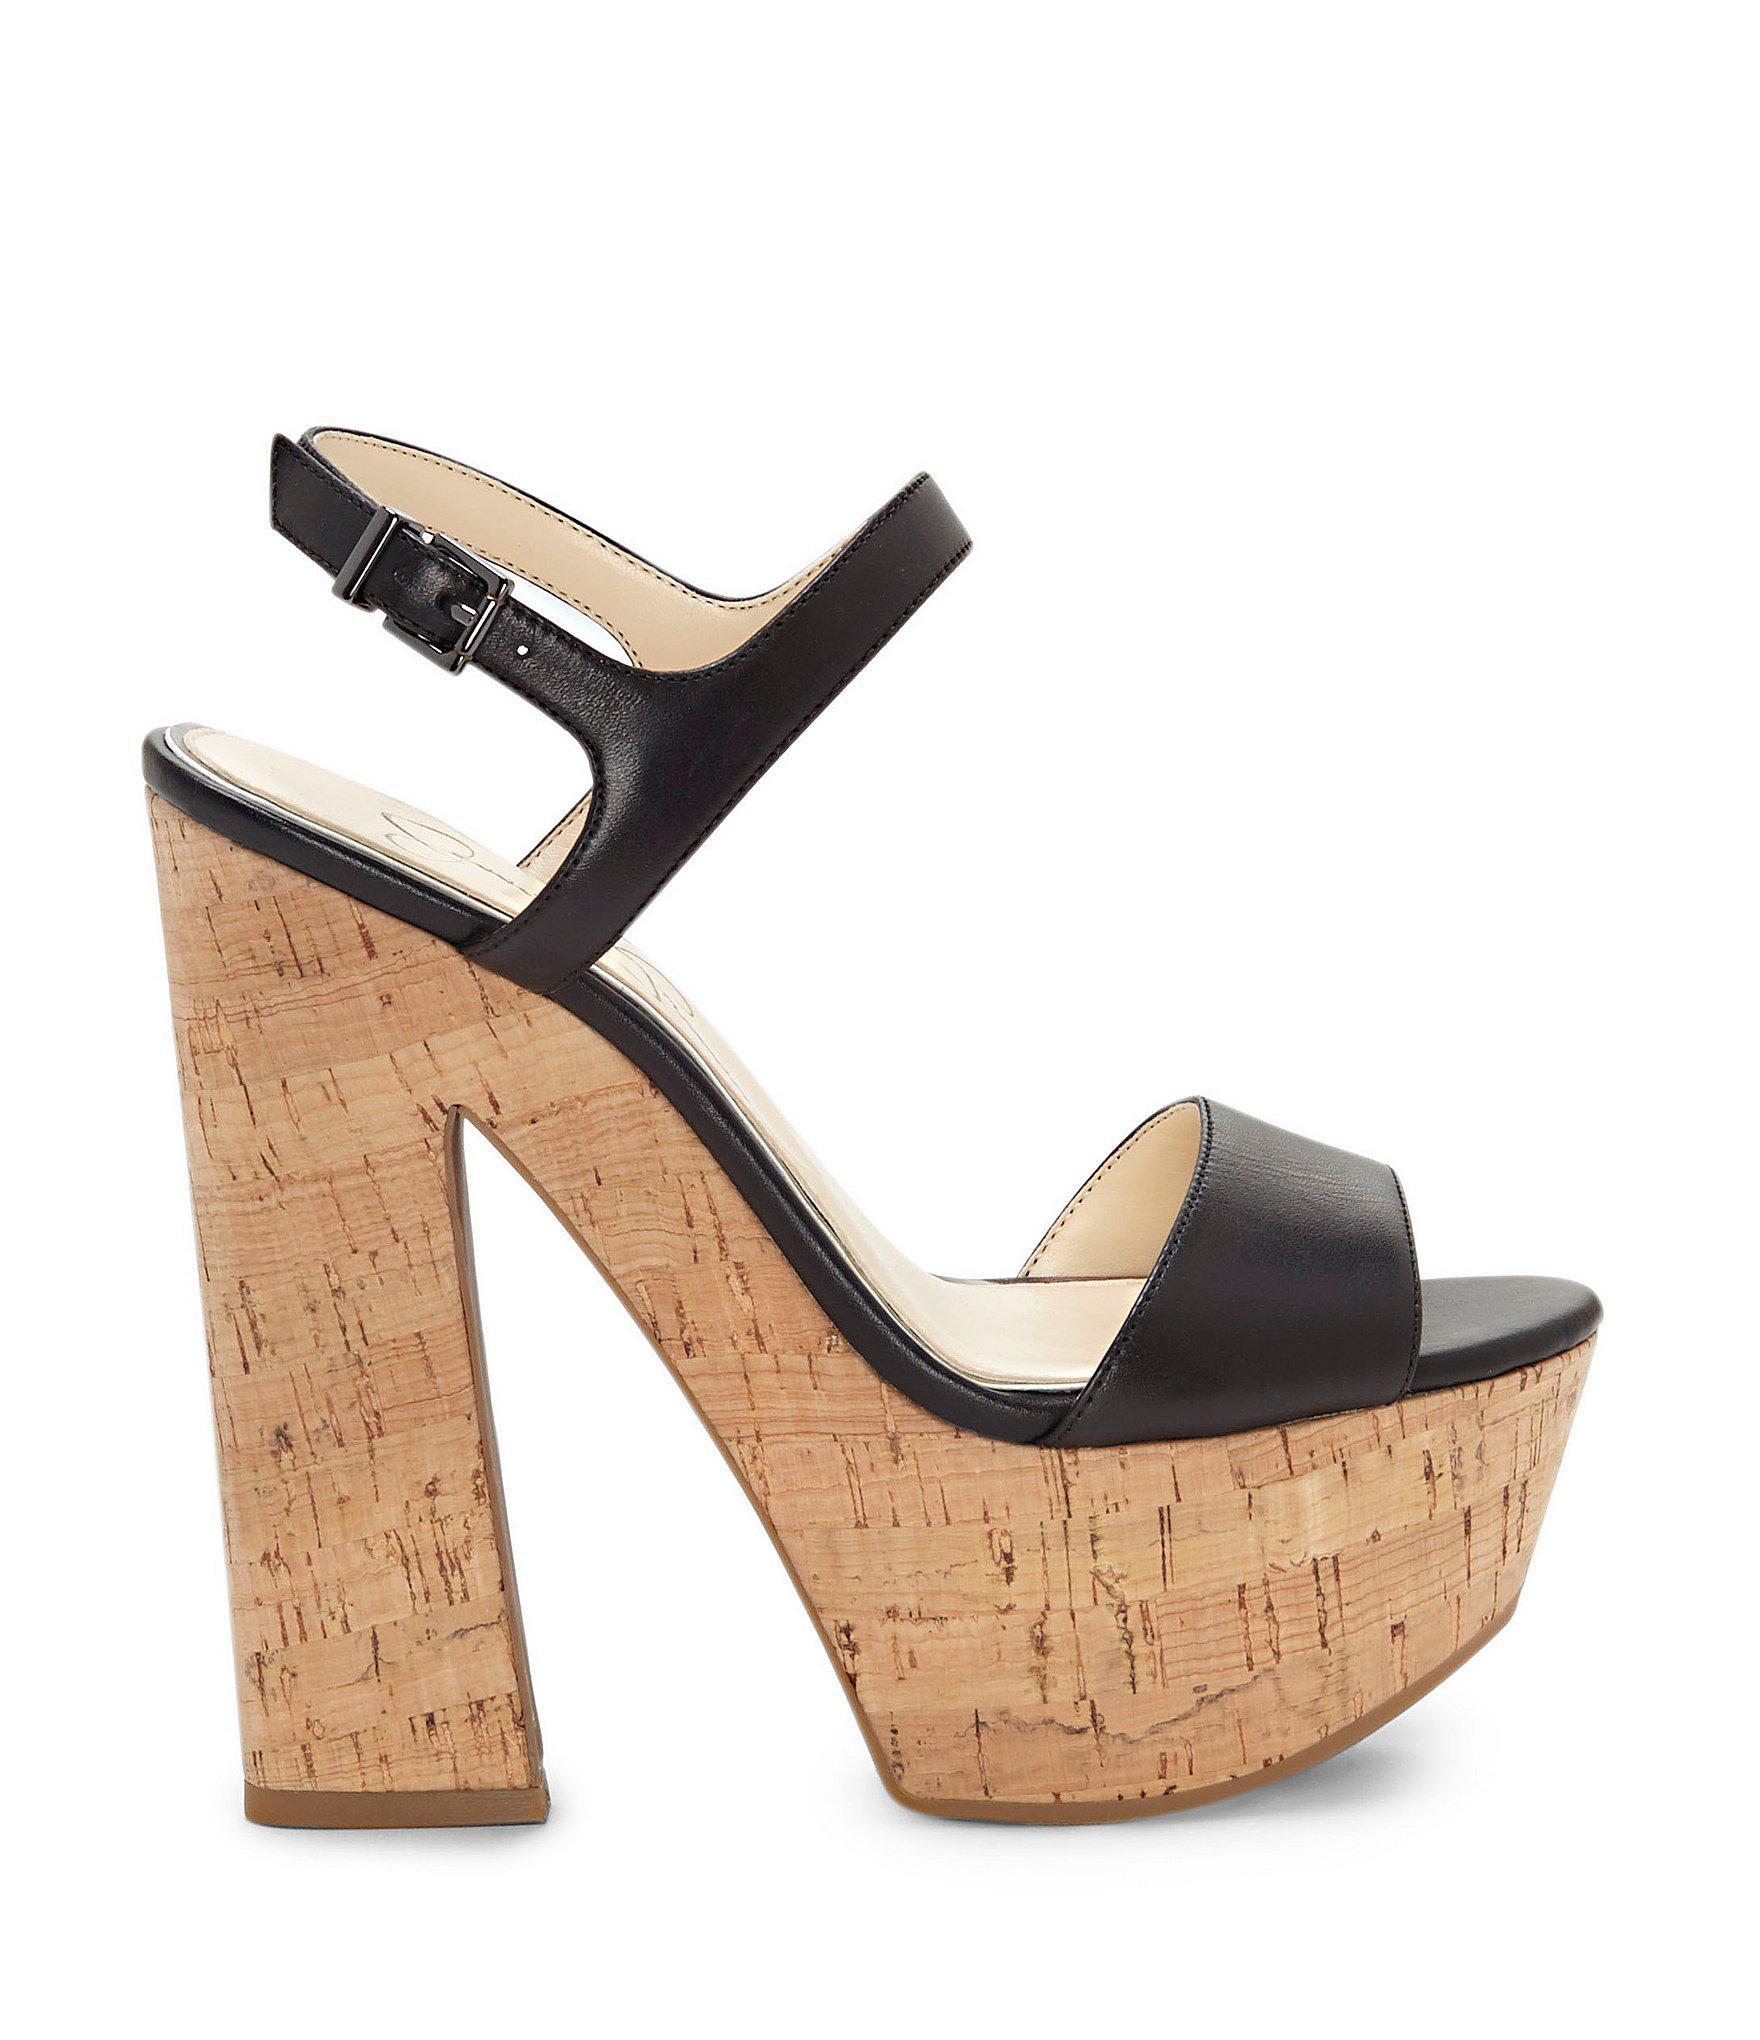 e959f8a0c3f Lyst - Jessica Simpson Divella Platform Sandals in Black